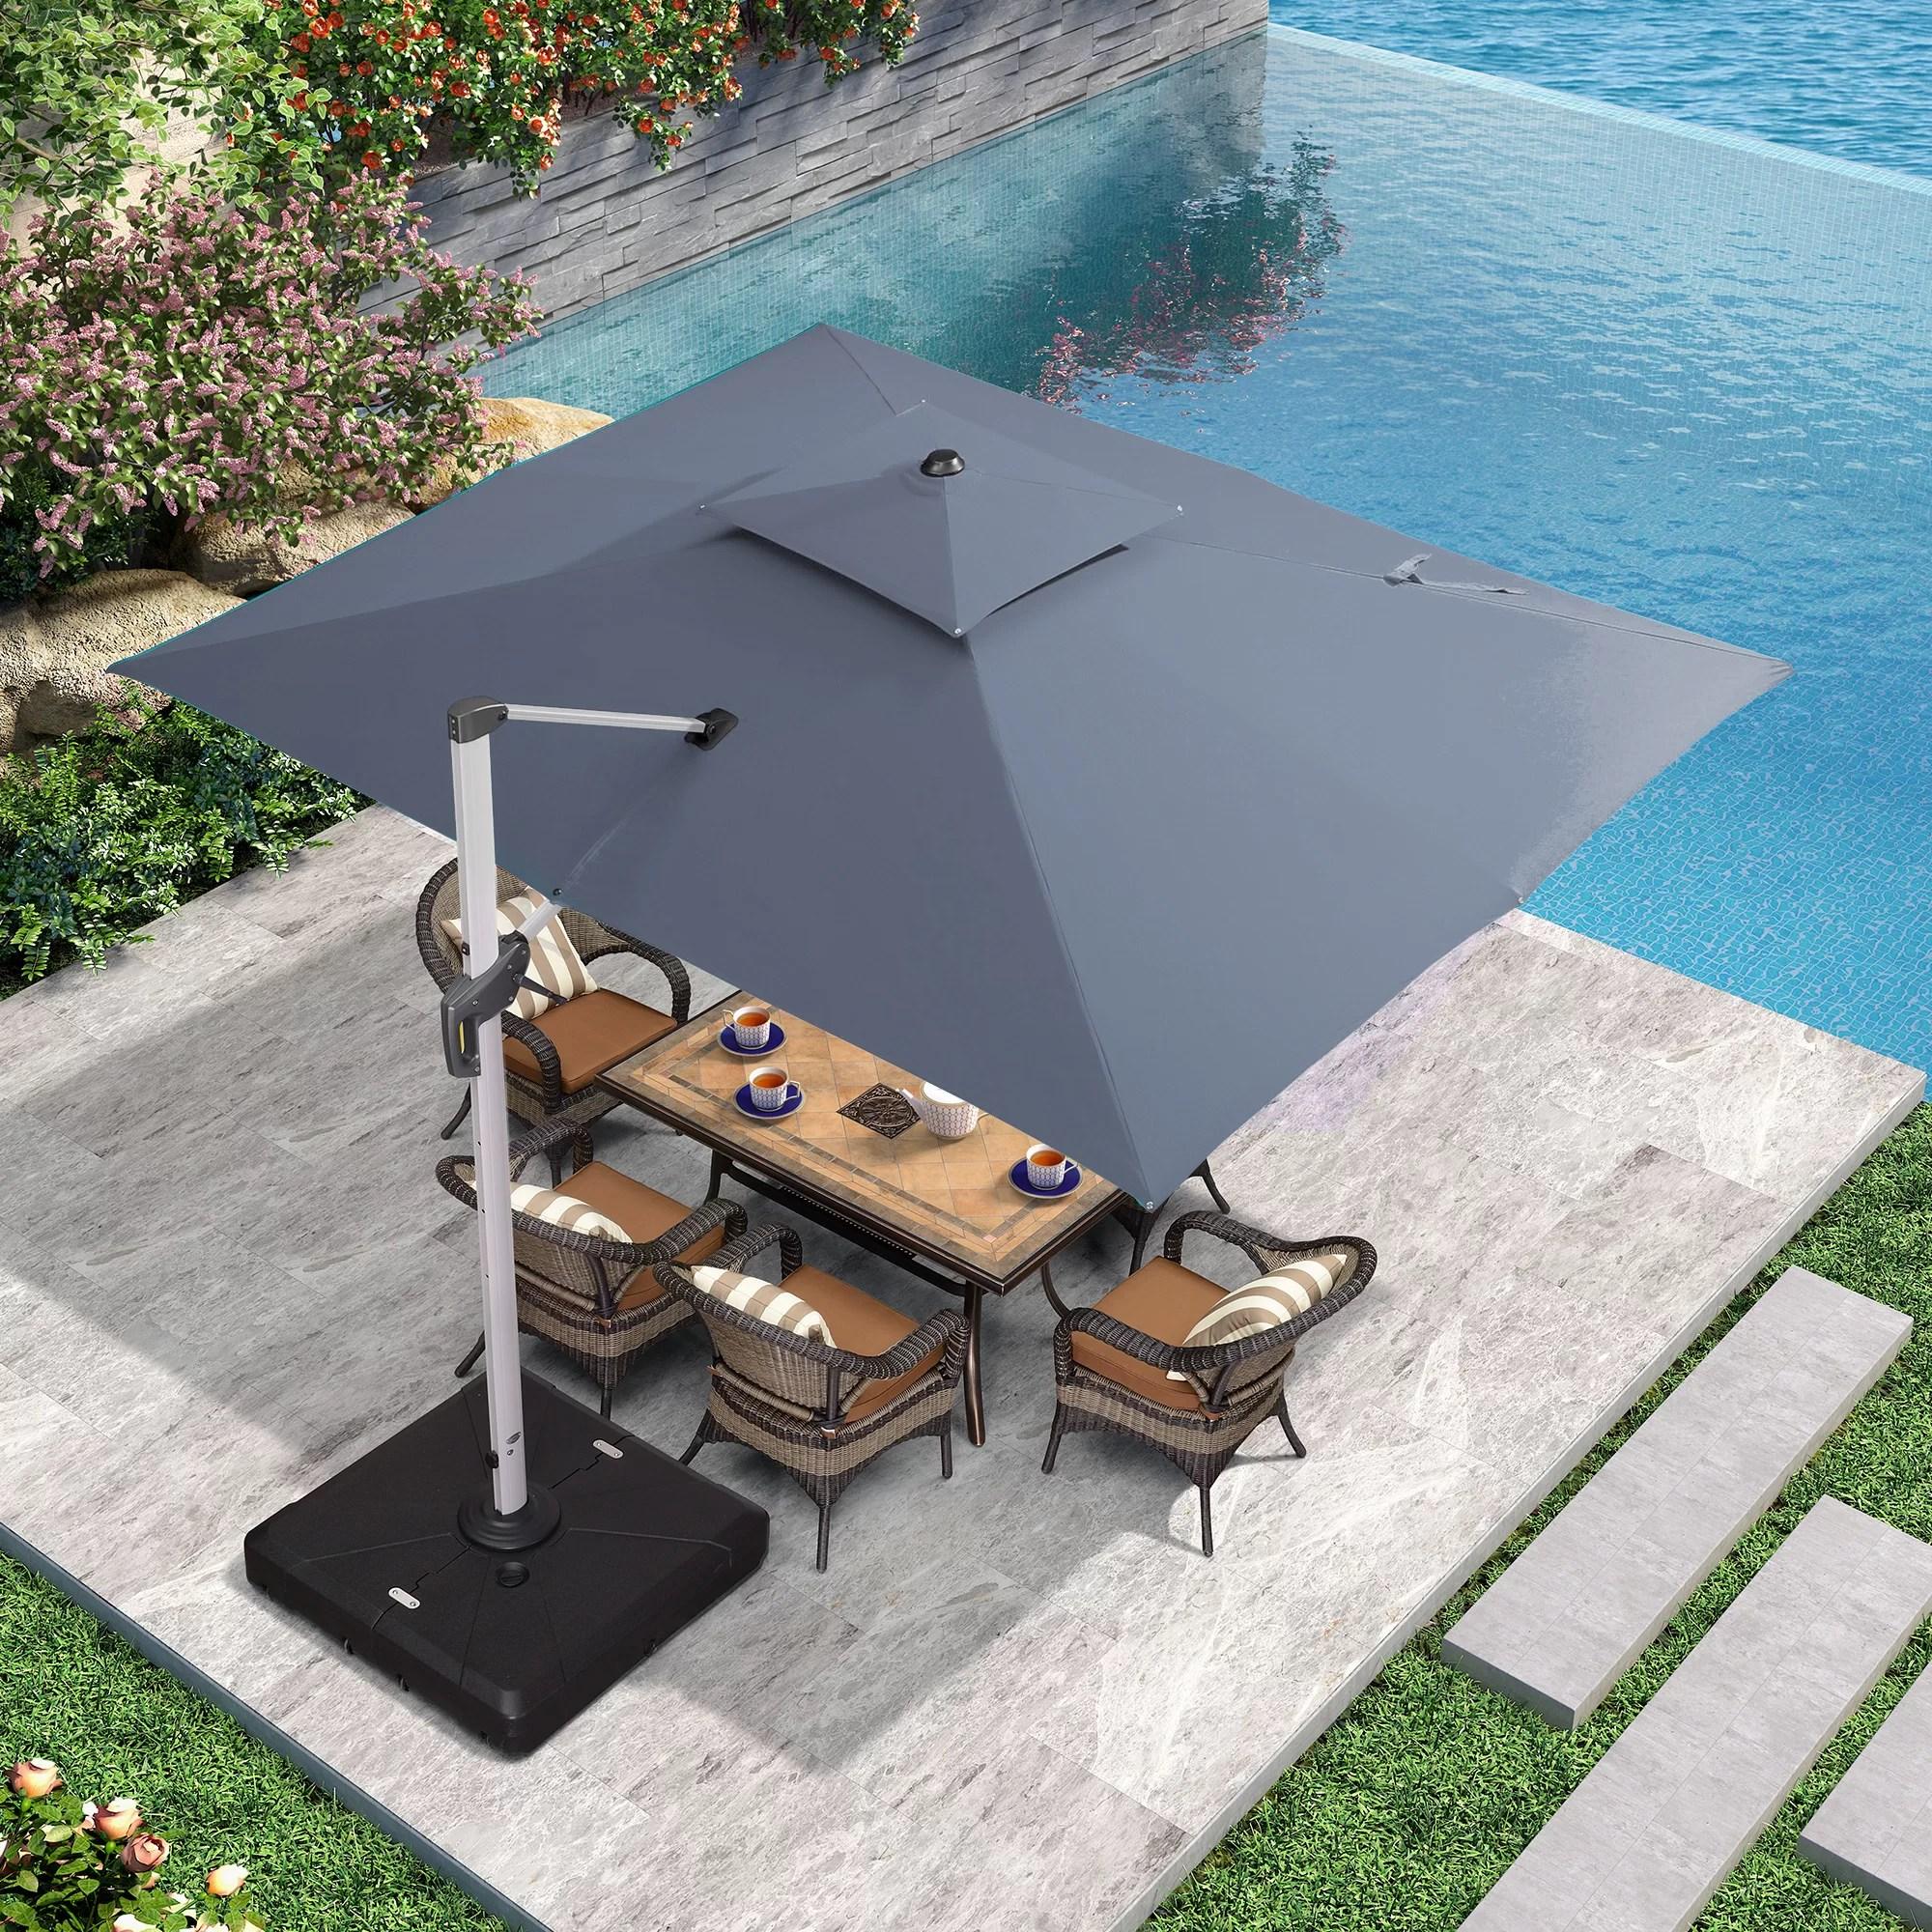 olivian 106 2 x 143 7 rectangular cantilever umbrella